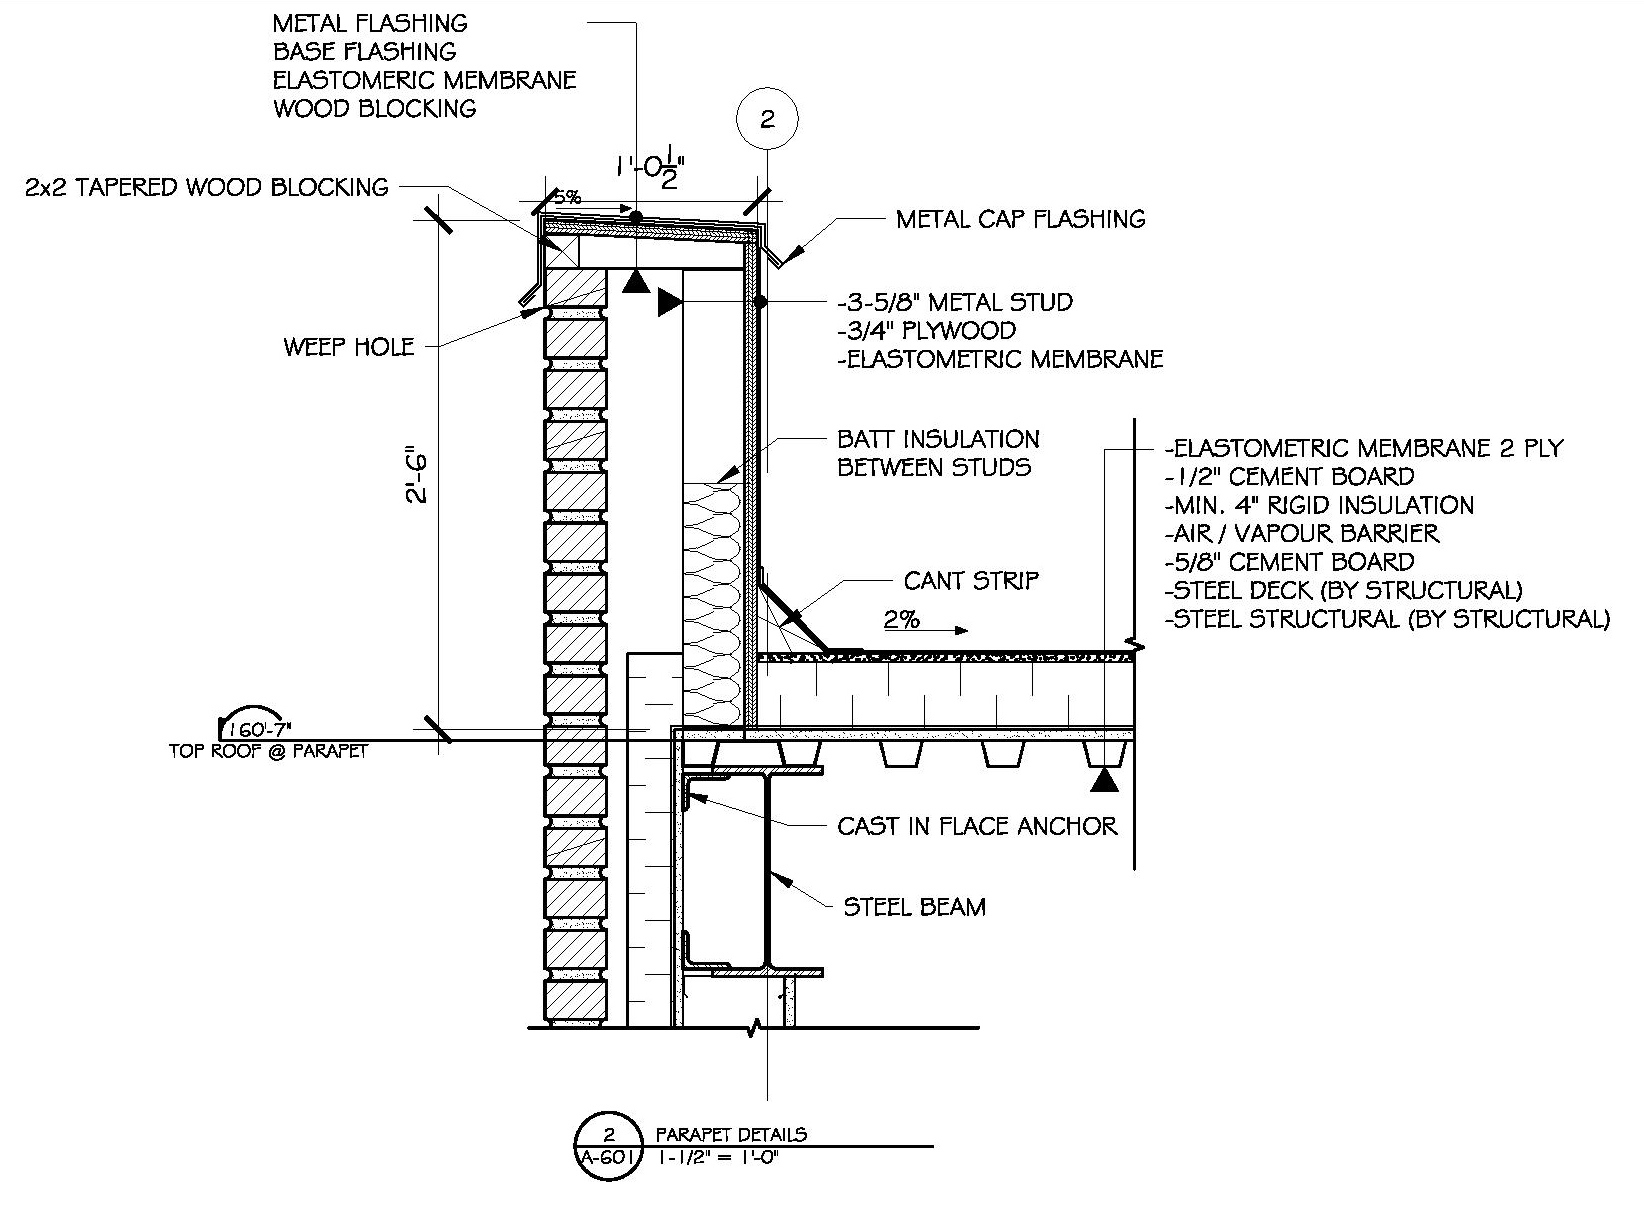 Commercial Building Plans by Raymond Alberga at Coroflot.com